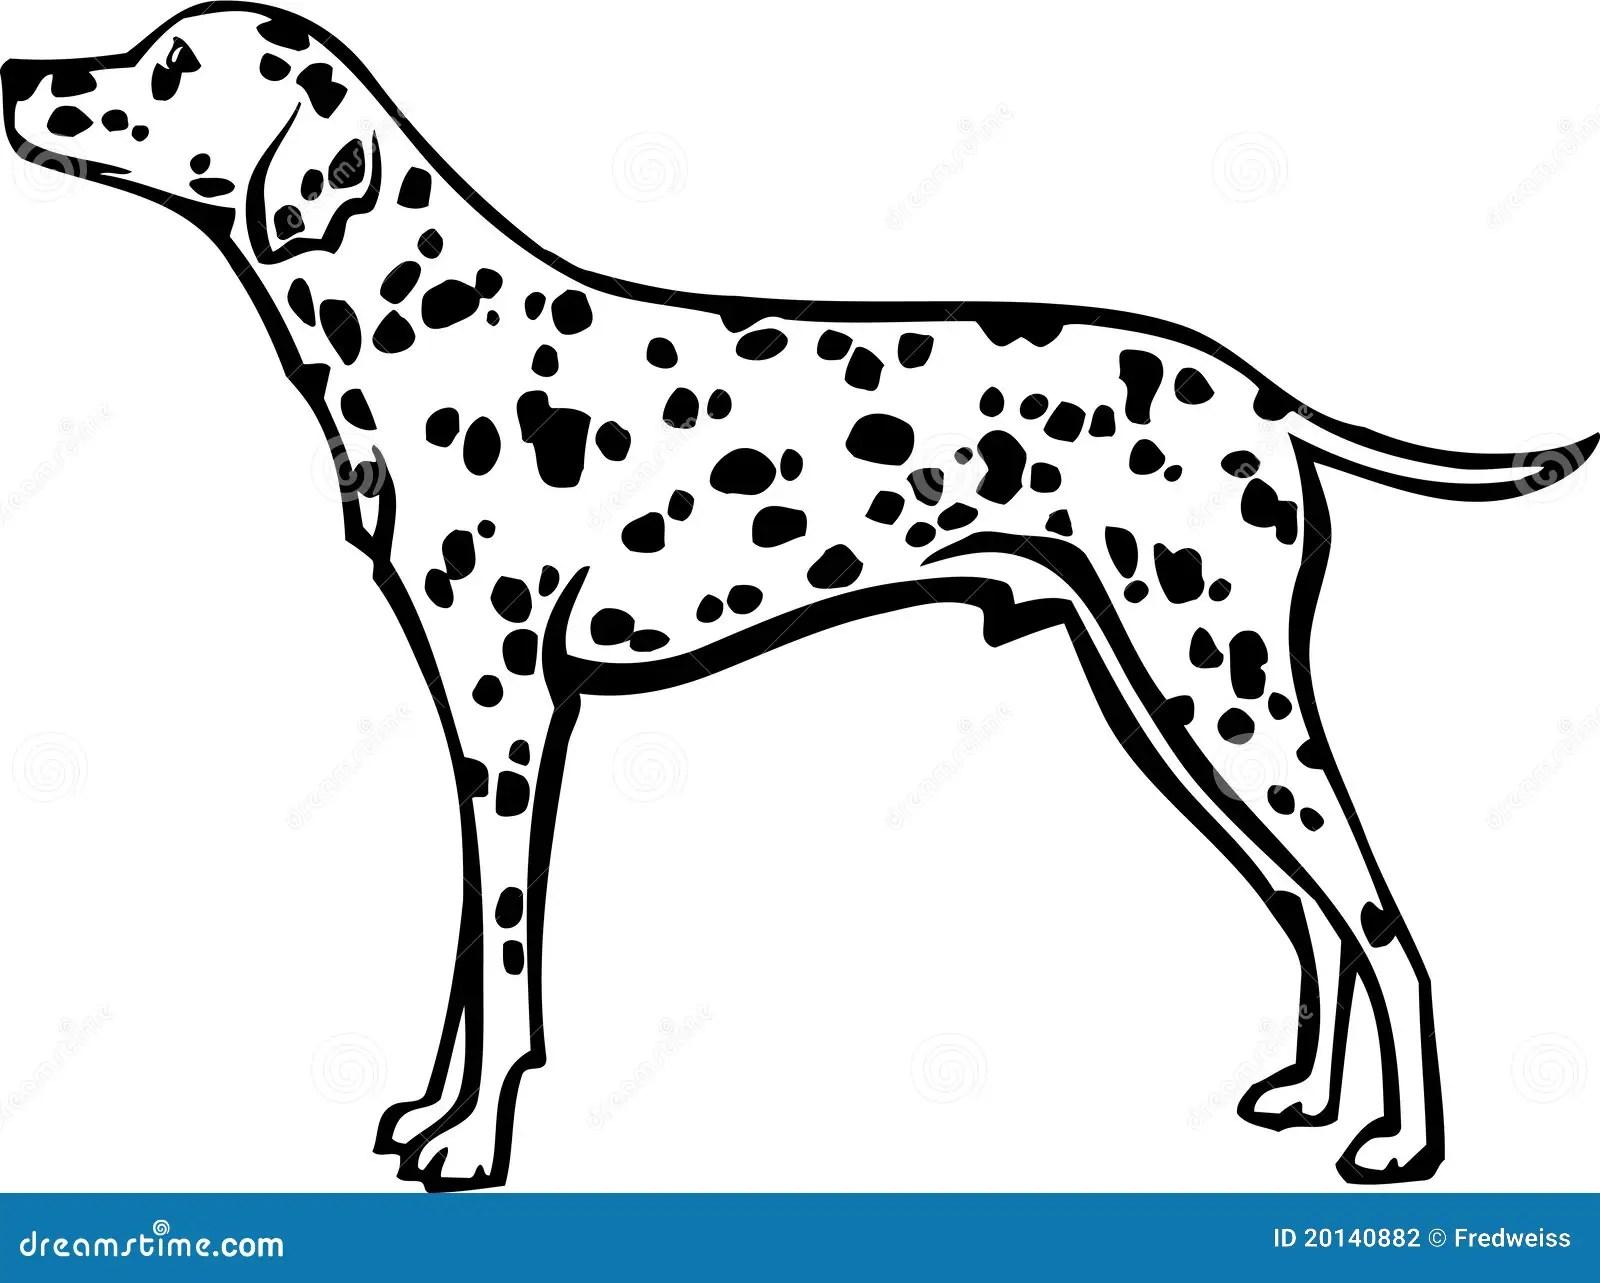 Dalmatian Illustration Stock Vector Illustration Of Line